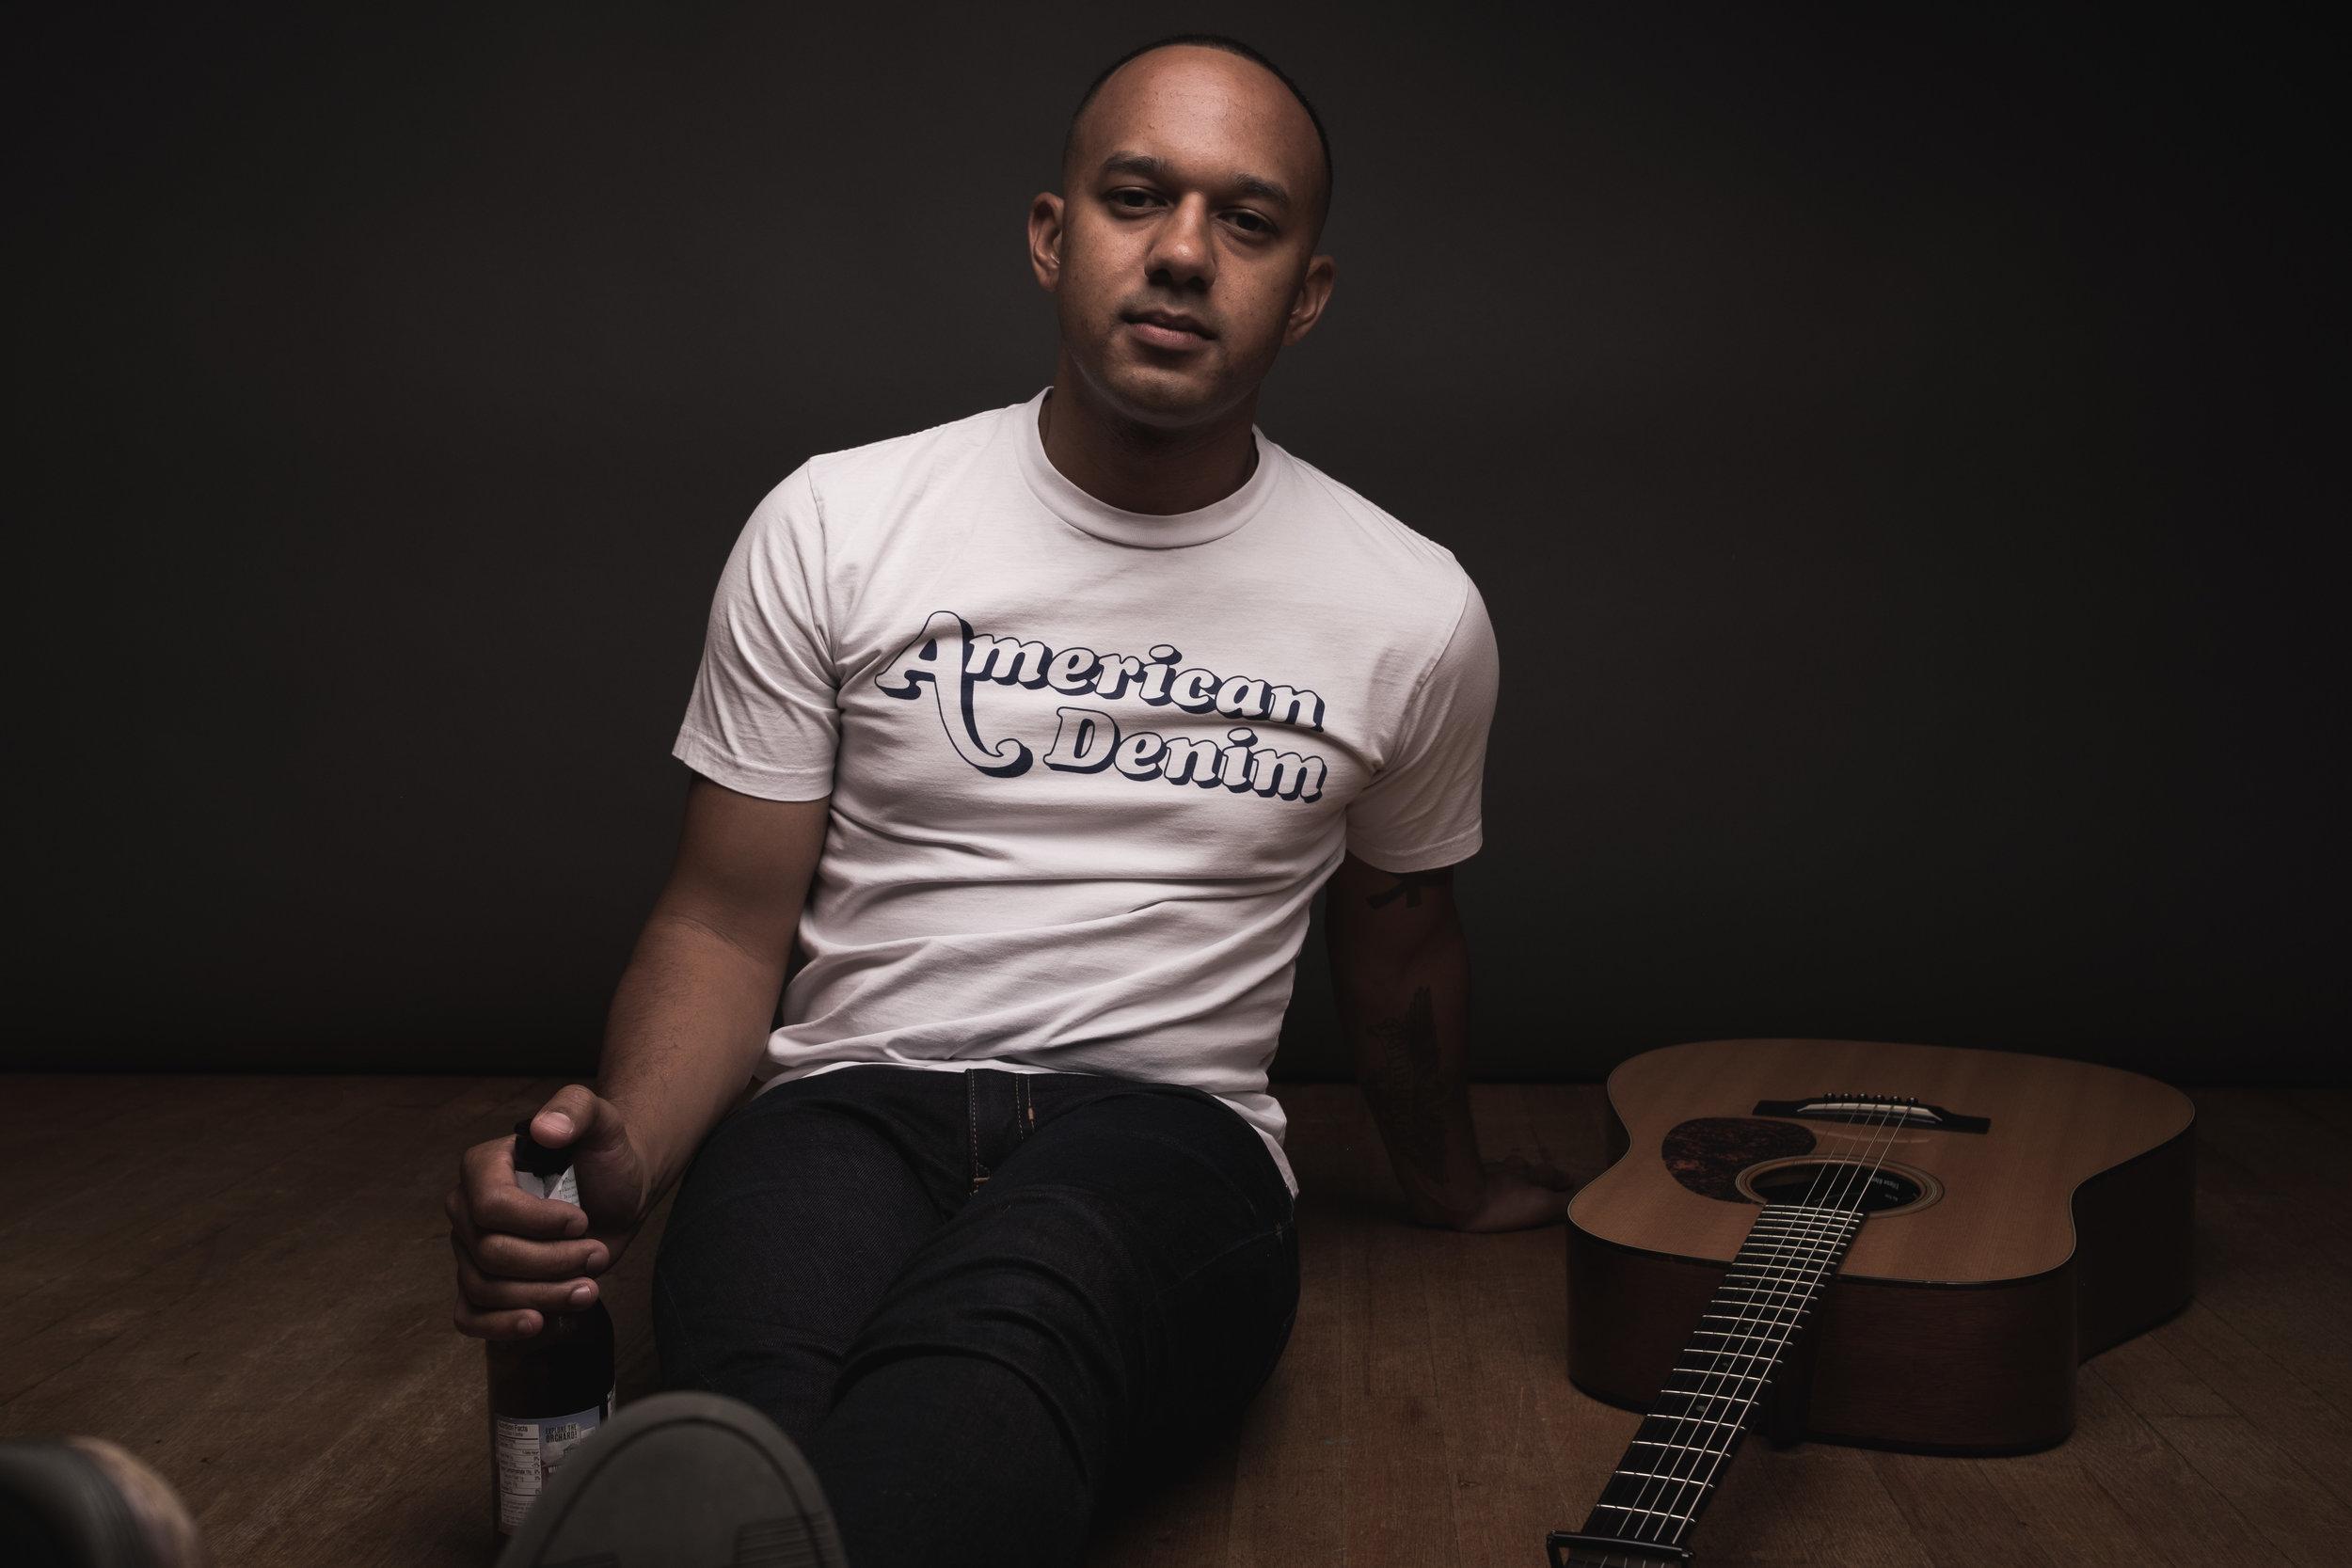 Mark-Webb-Jr-Dashboard-Confessional-New-Album-Crooked-Shadows-Chris-Carrabba-Cowrite-Newmusic-Alternative-Rock-Greenville-SouthCarolina.jpg